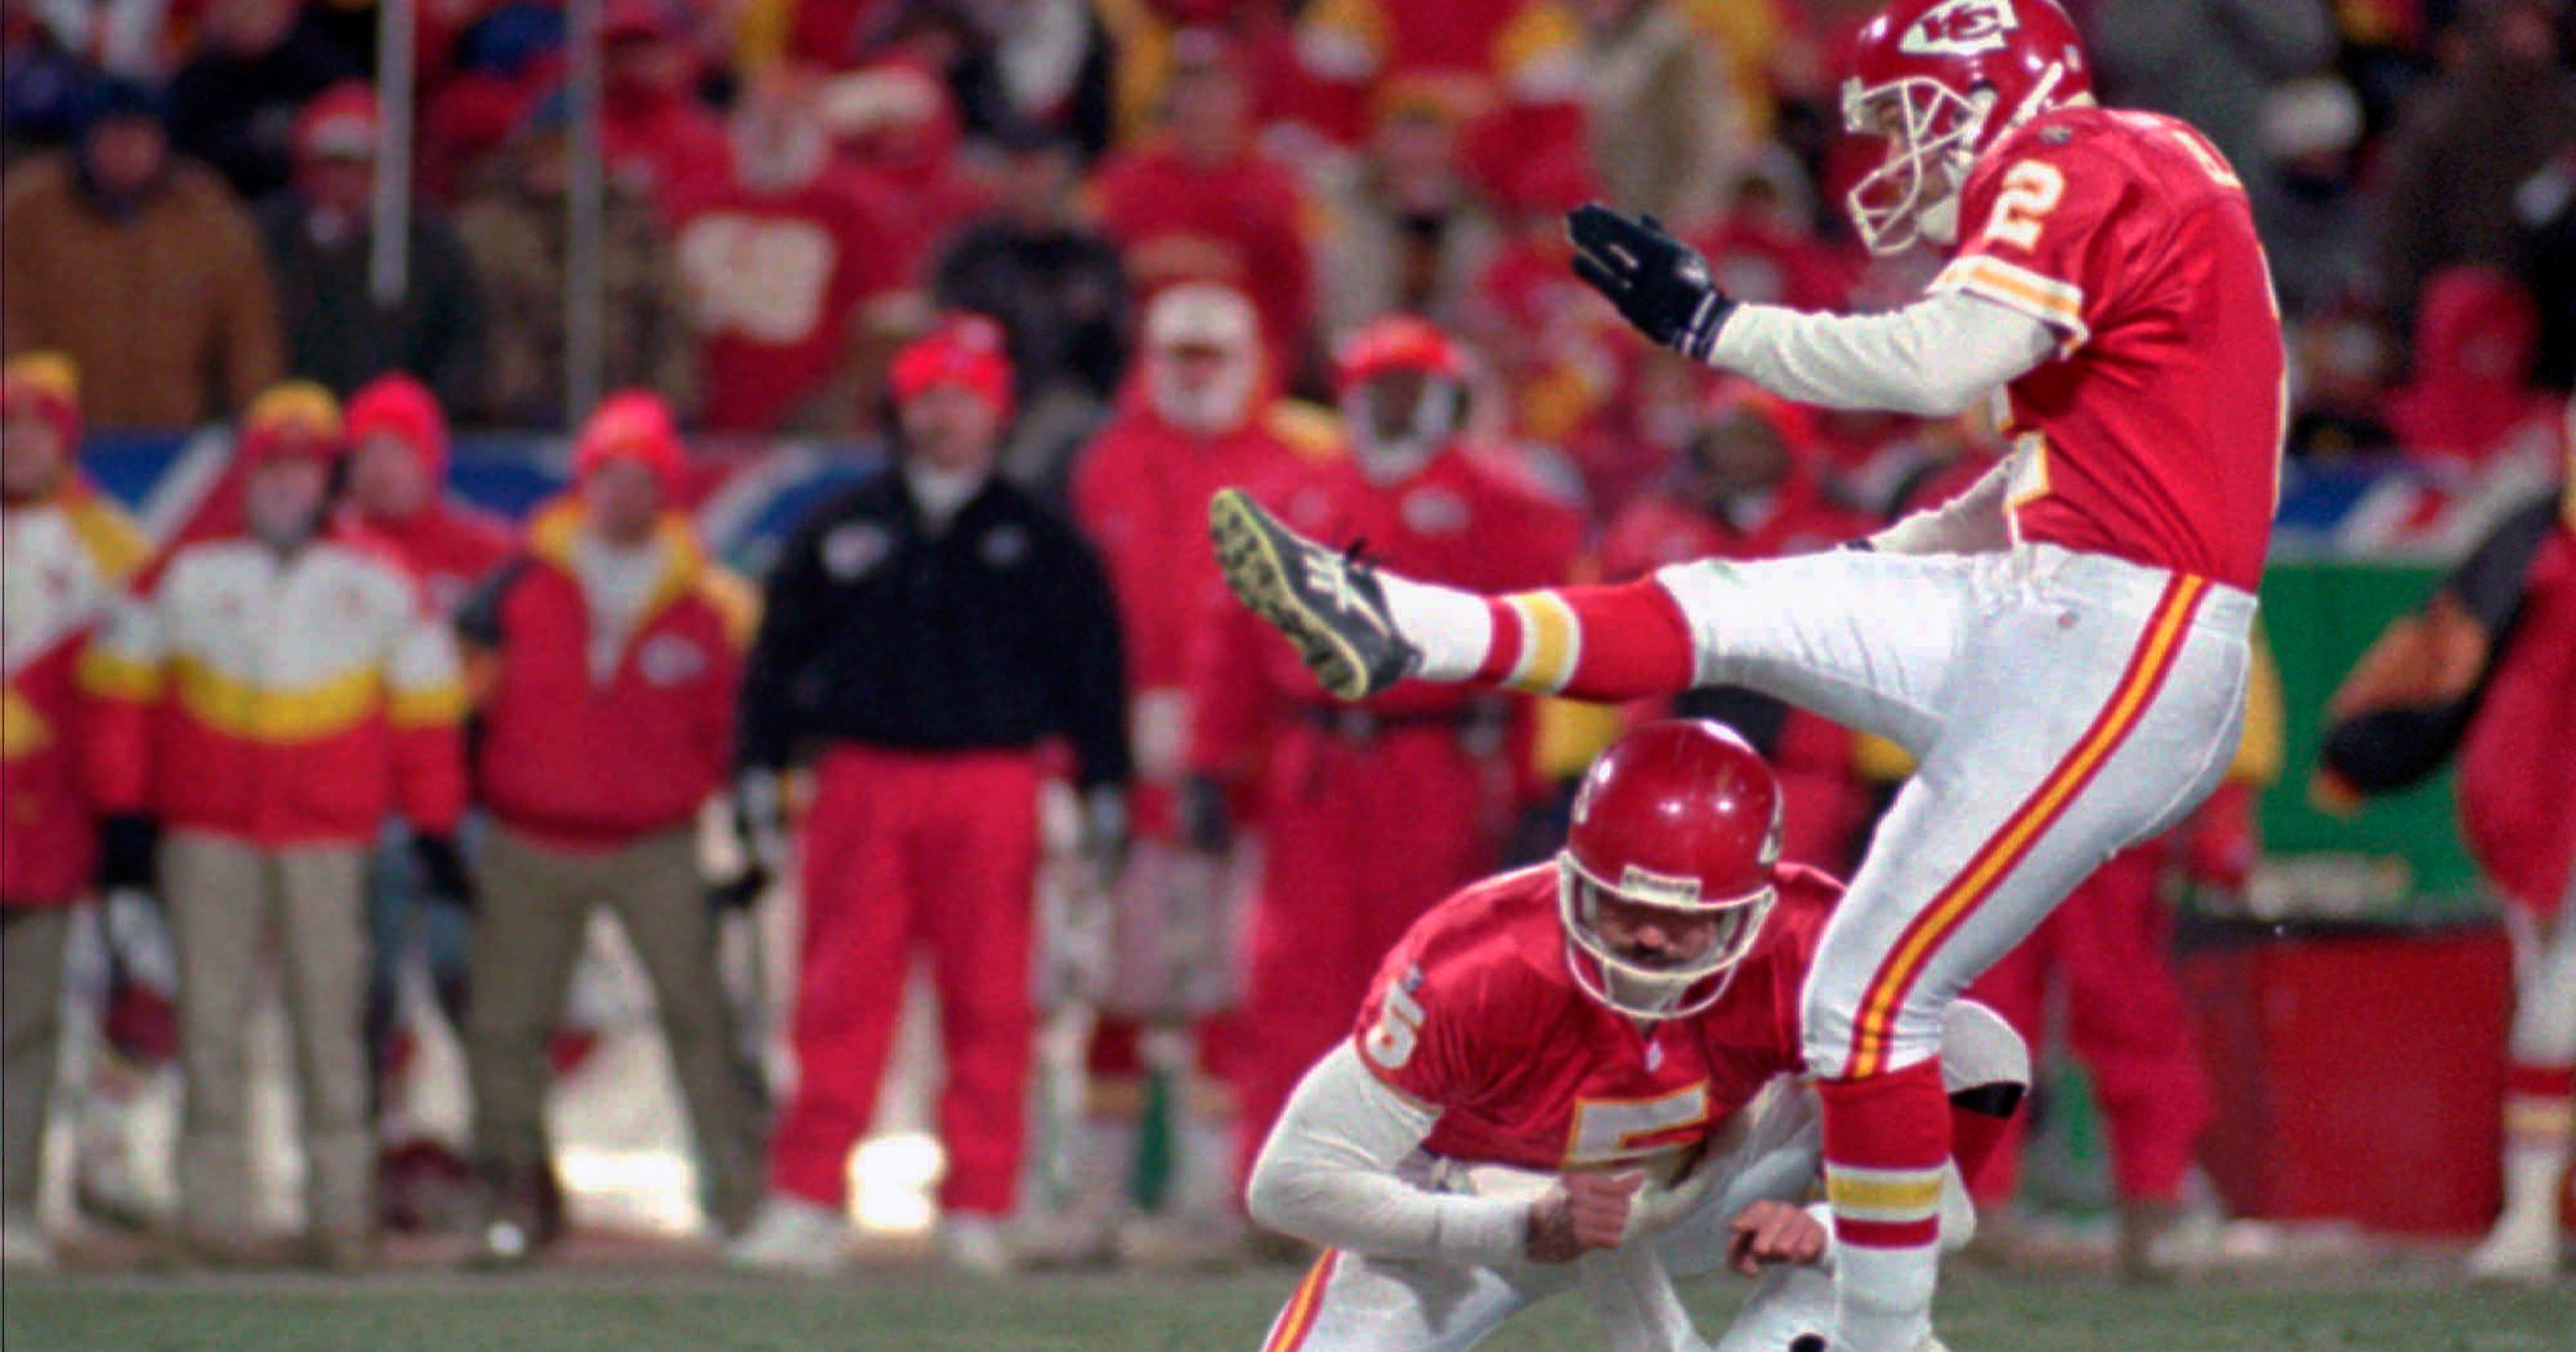 Chiefs aim to rewrite playoff history vs nemesis Colts 836249b2d